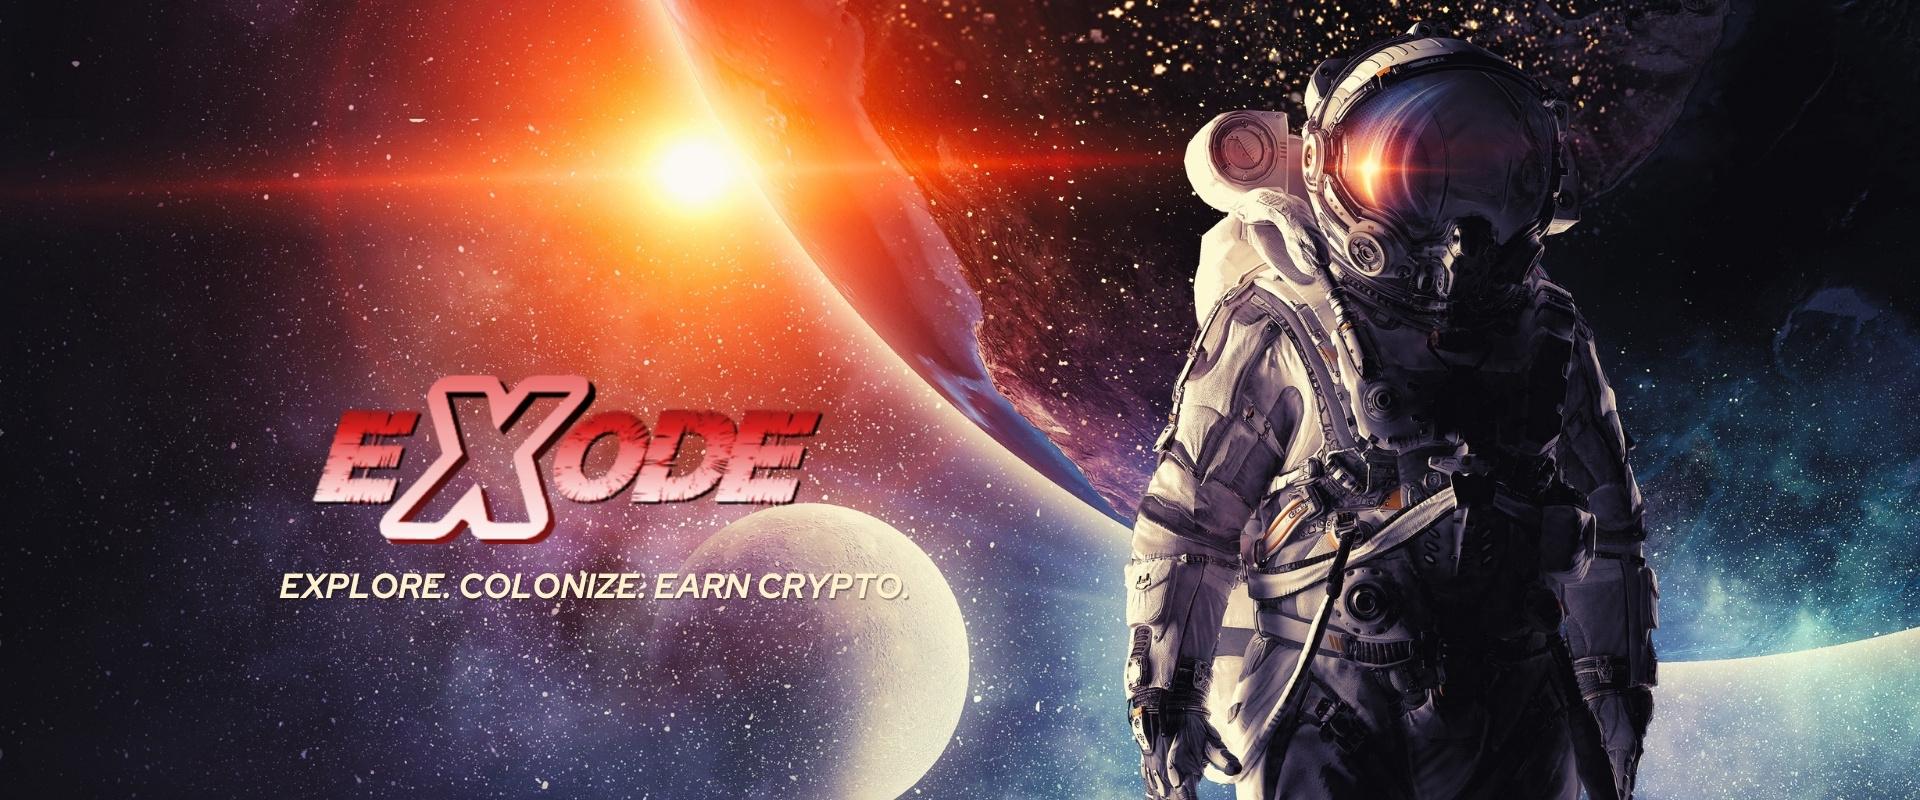 Exode Game.jpg